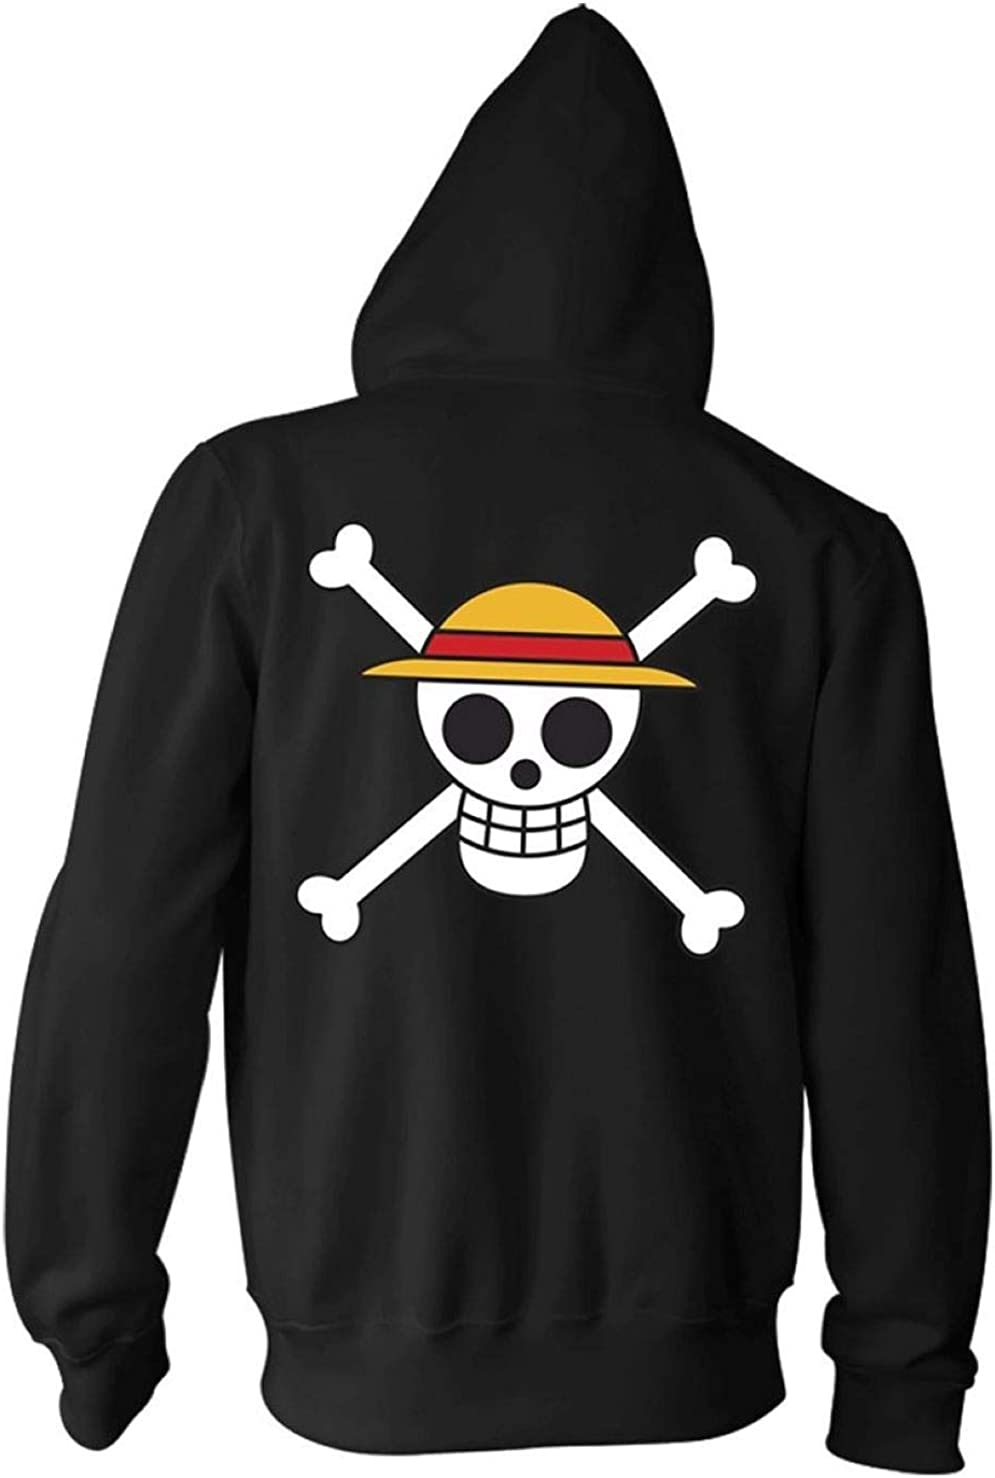 Ripple Sales results No. 1 Junction One Piece Adult Las Vegas Mall Luffy Hat Zip Hoodi Fleece Straw